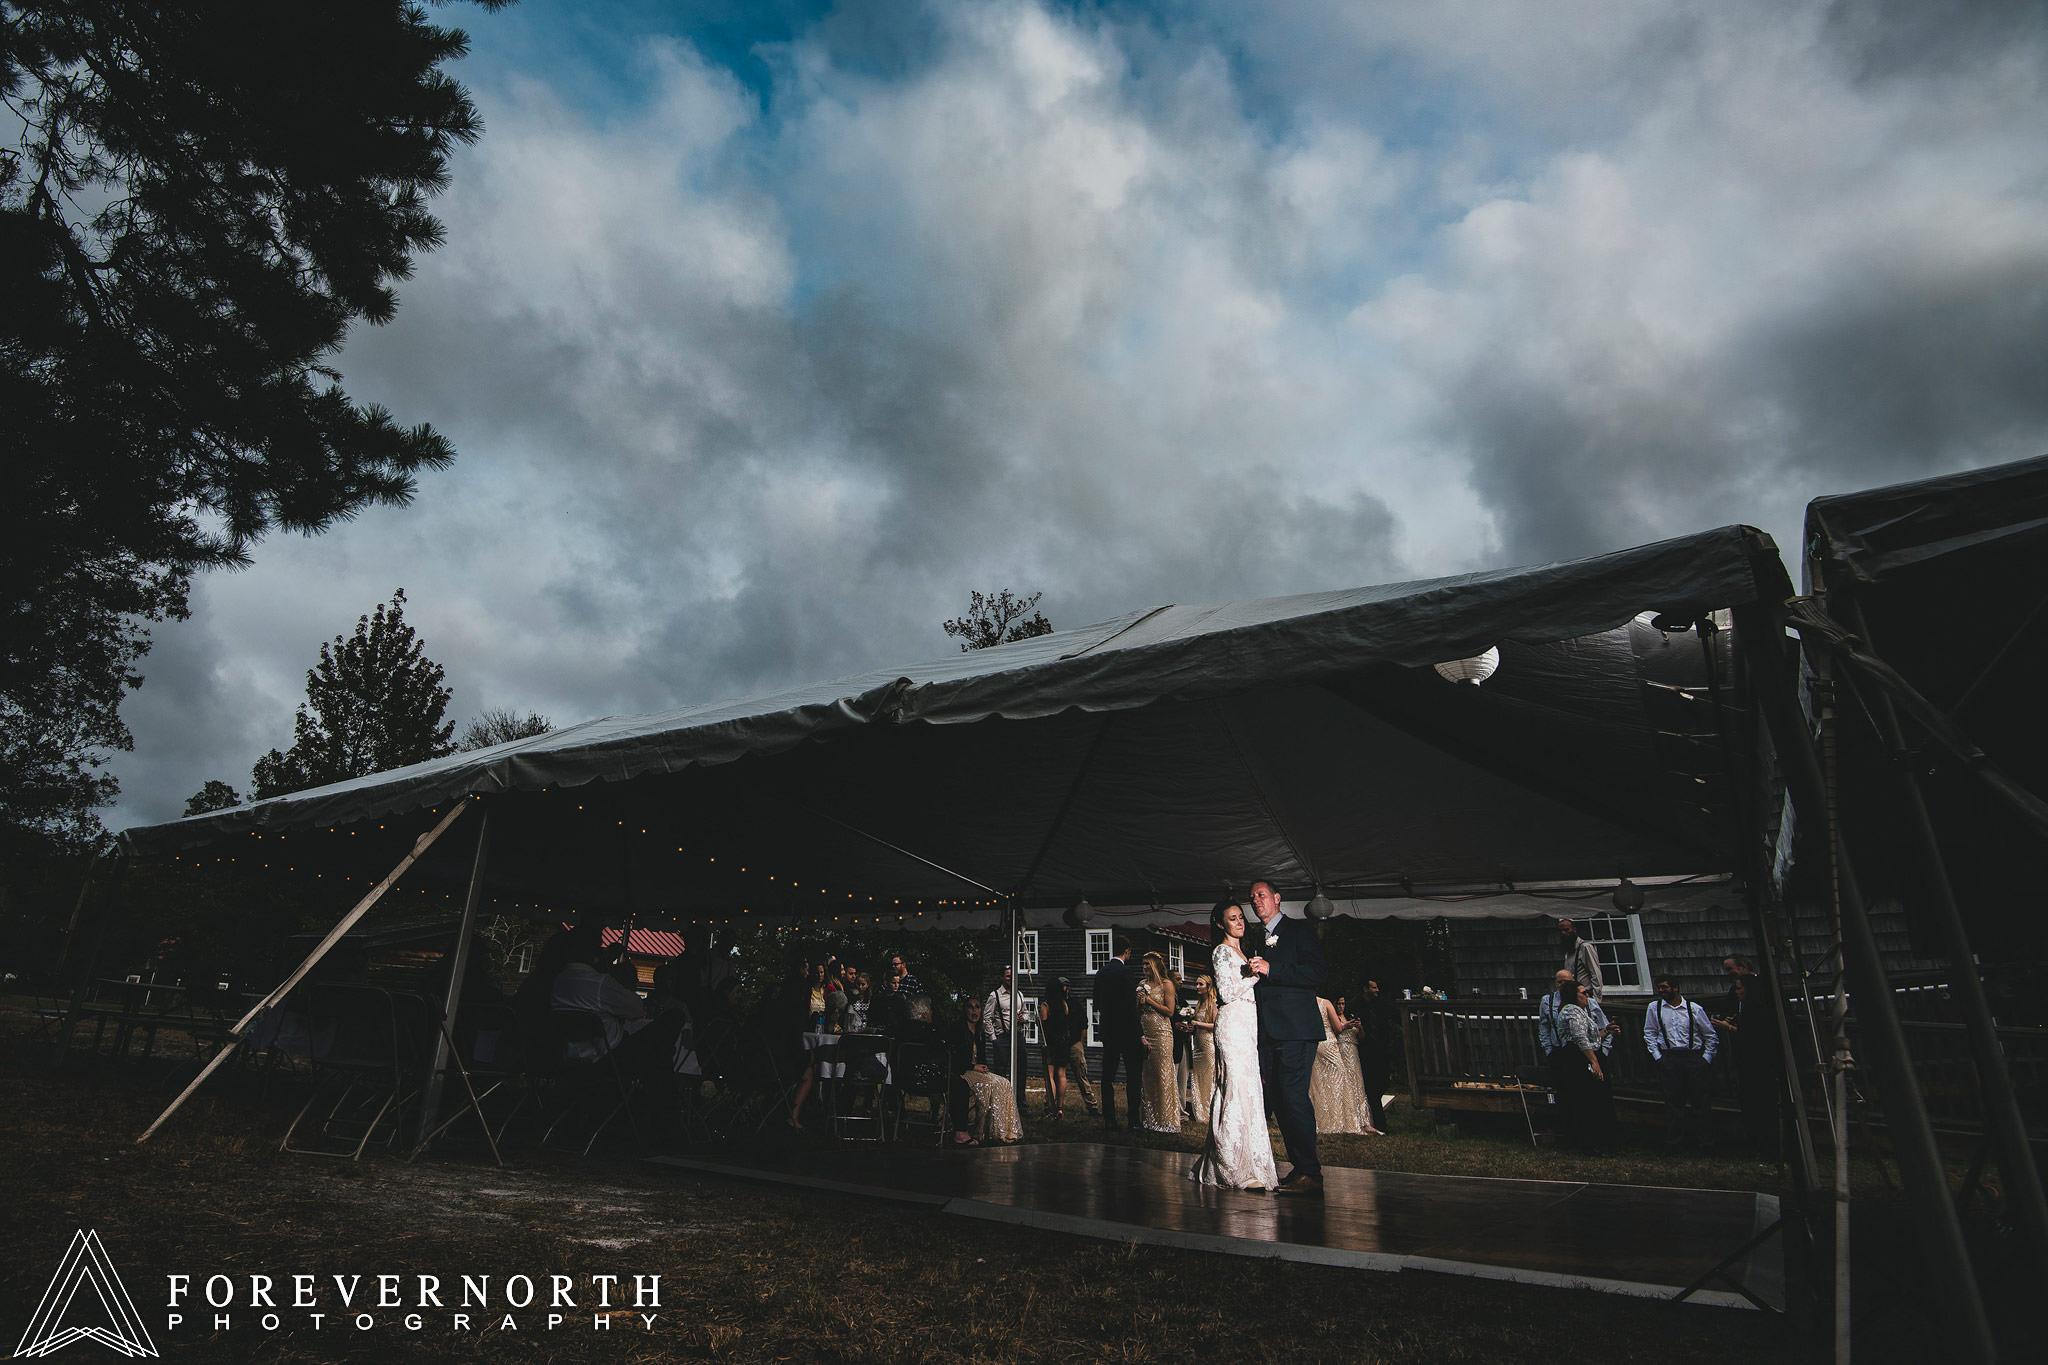 Perkins-Whitesbog-Village-Wedding-Photographer-30.JPG